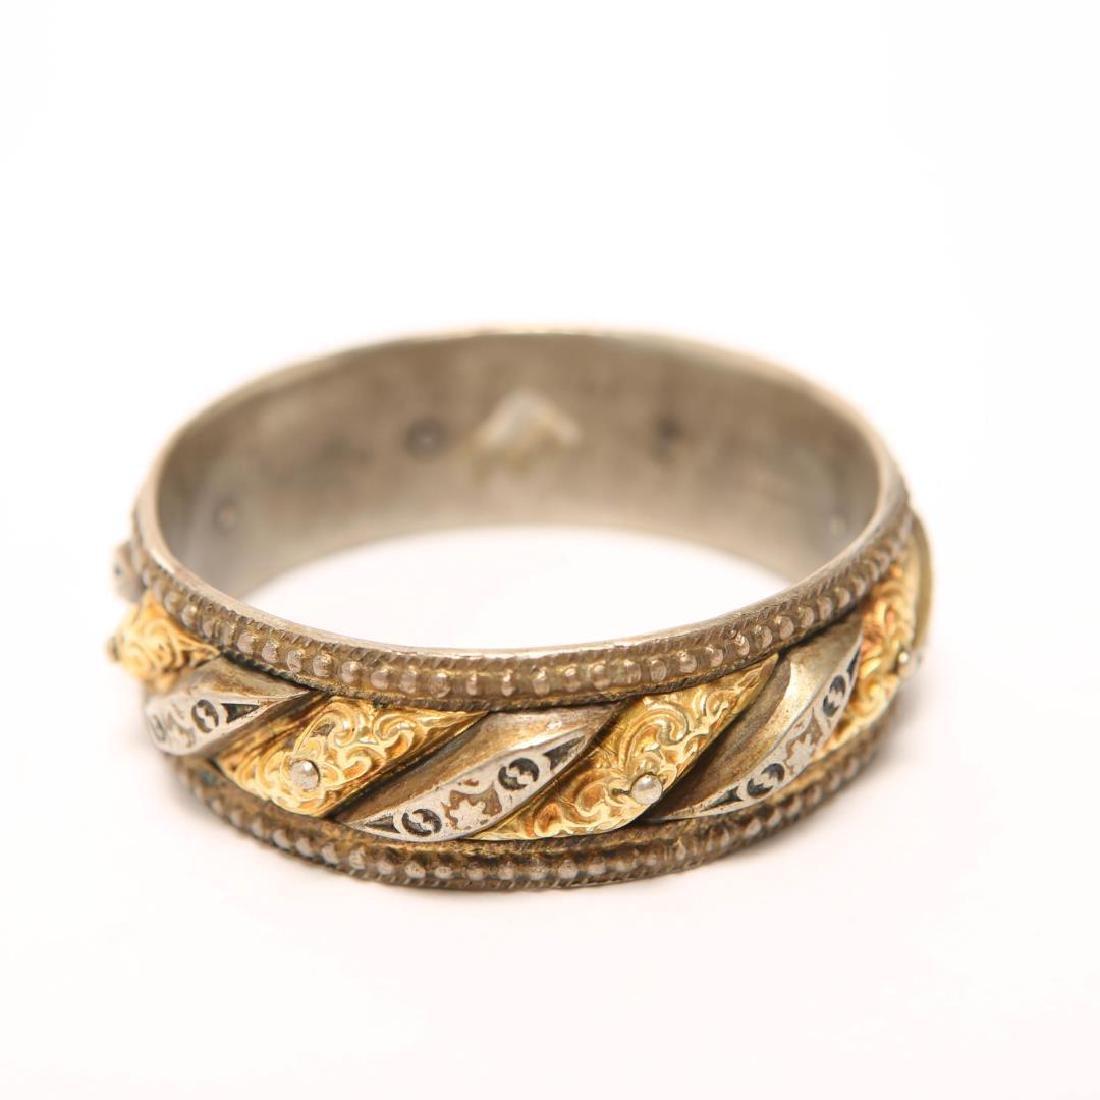 Renaissance-Revival Silver Bangle w. Applied Gold - 2